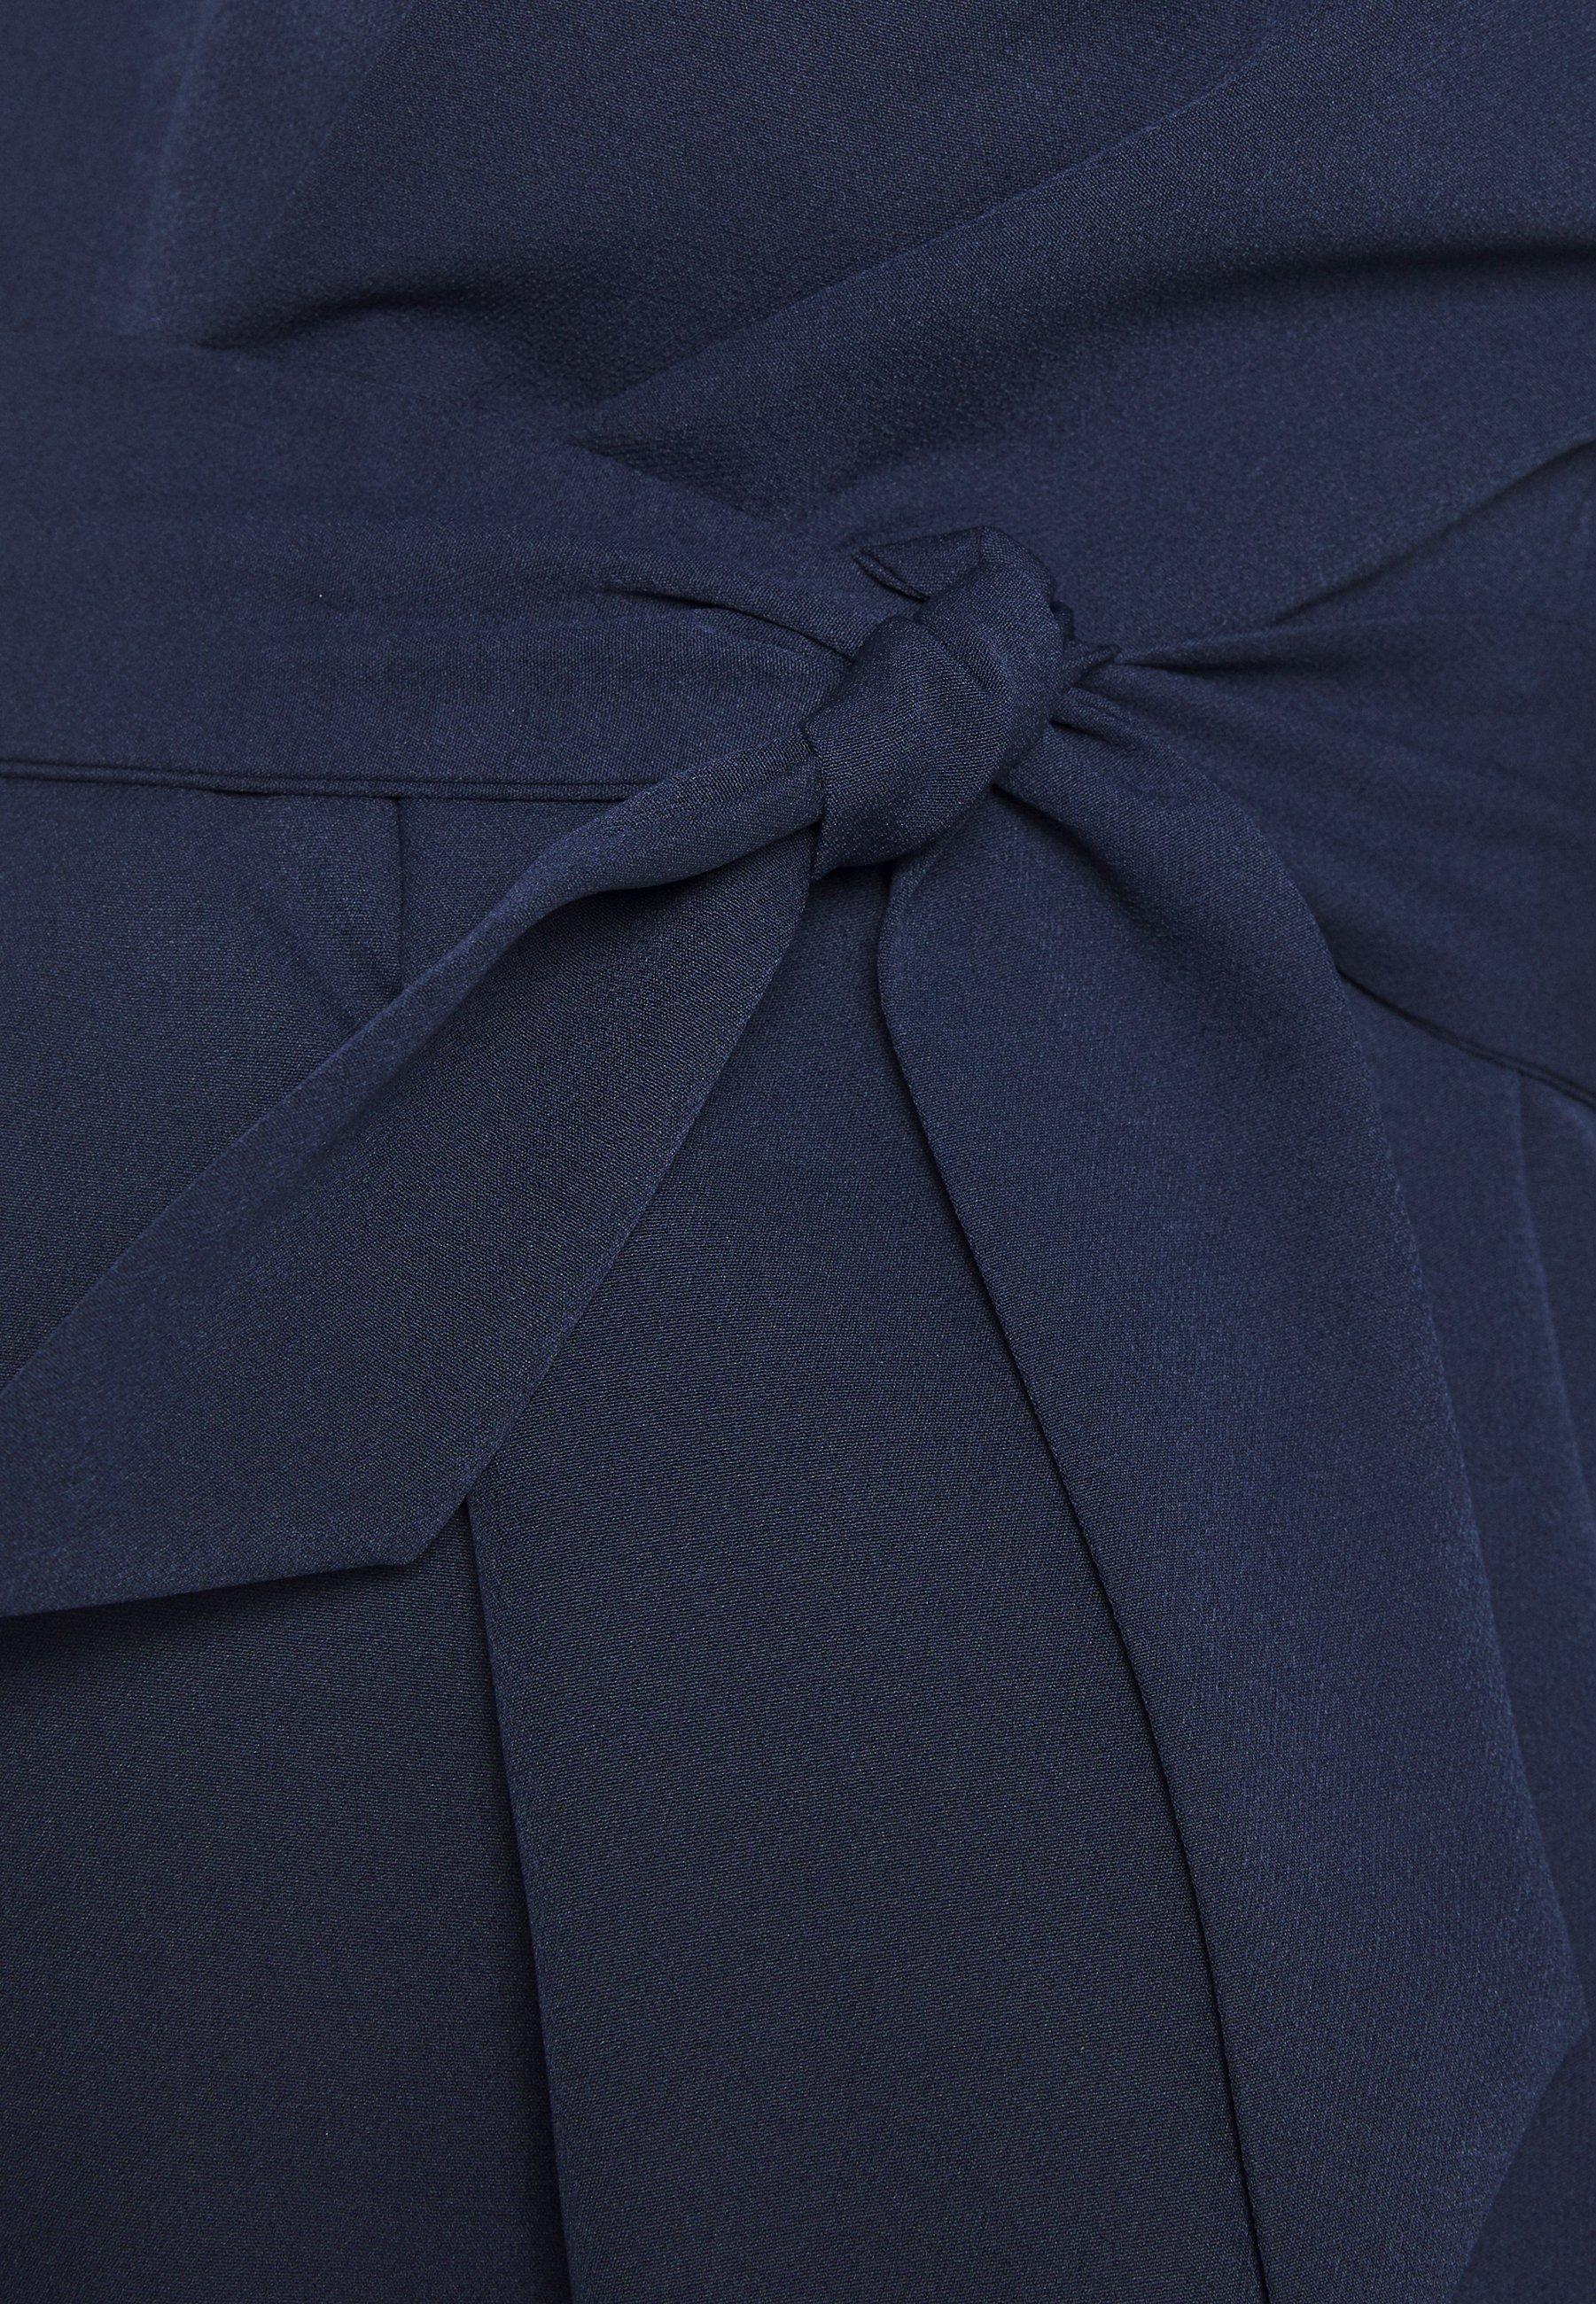 9Fashion DAVEA Etuikleid dark blue/dunkelblau